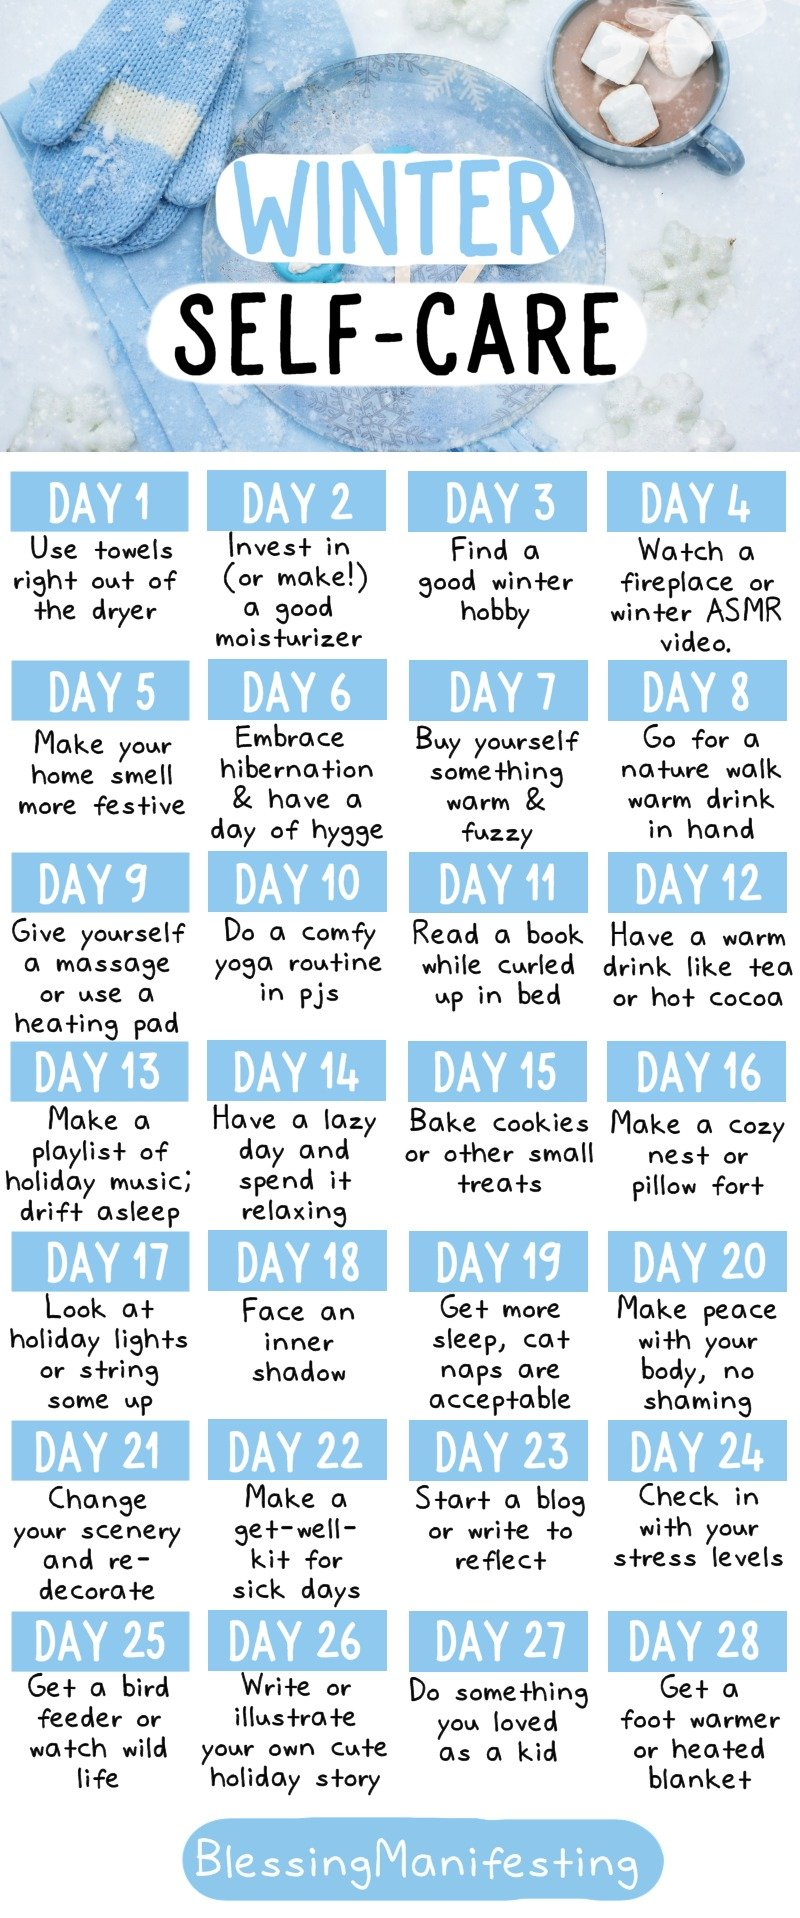 winter self-care